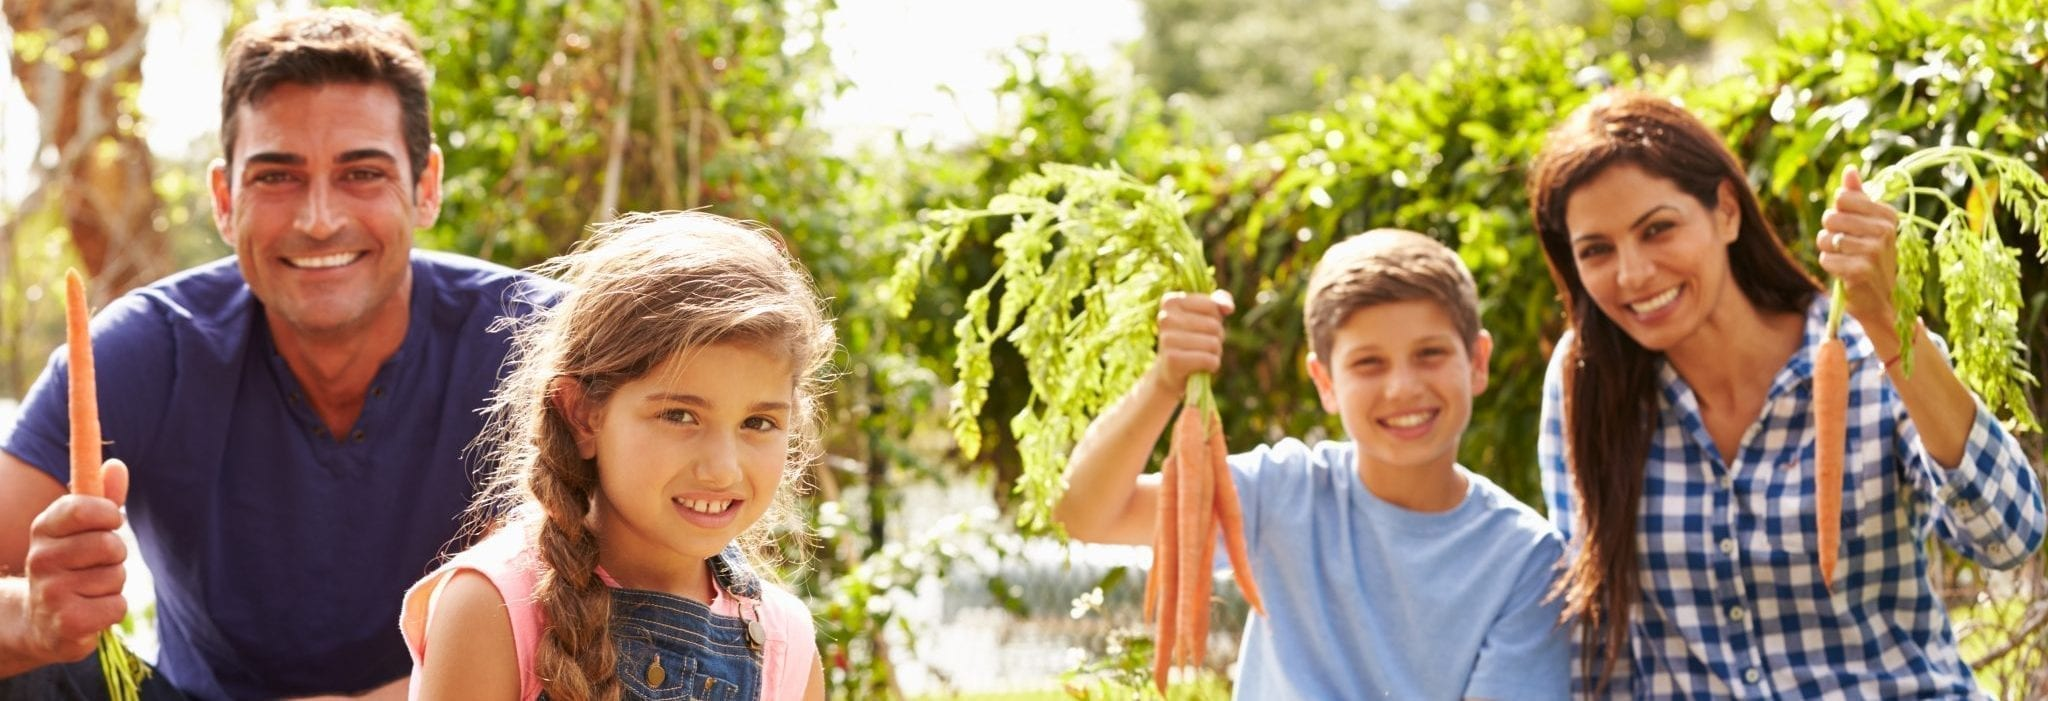 family of 4 picking carrots from garden